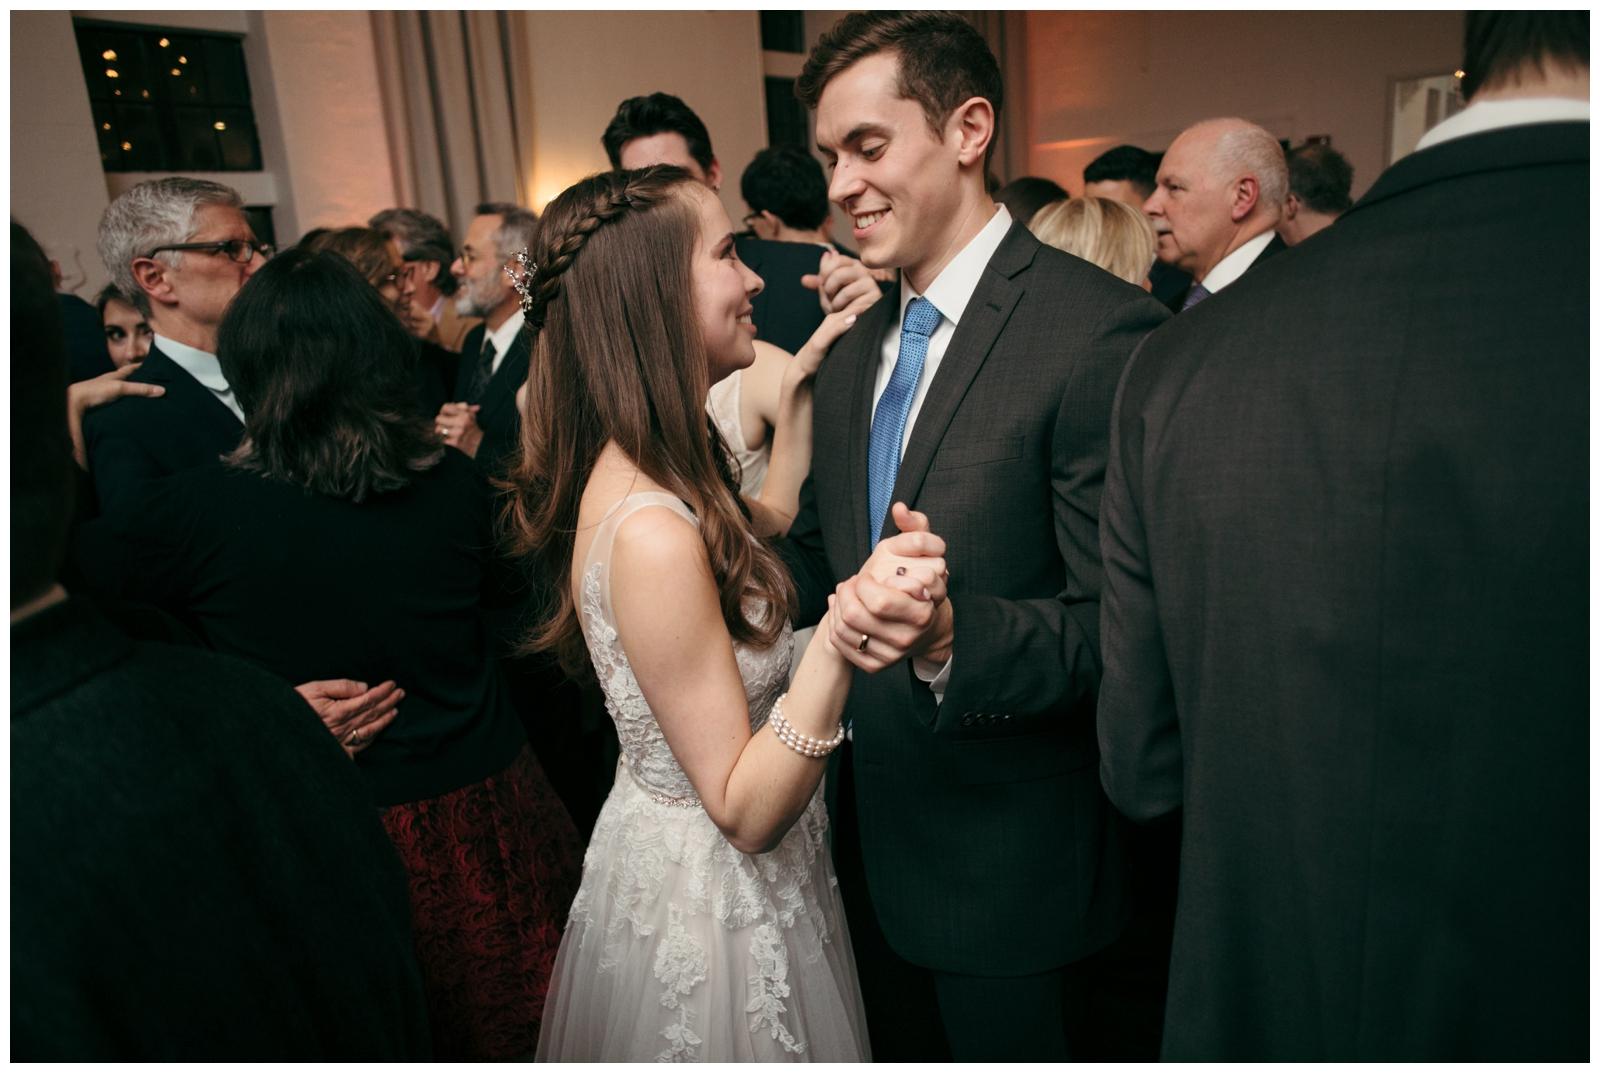 Alden-Castle-Wedding-Boston-Bailey-Q-Photo-061.jpg